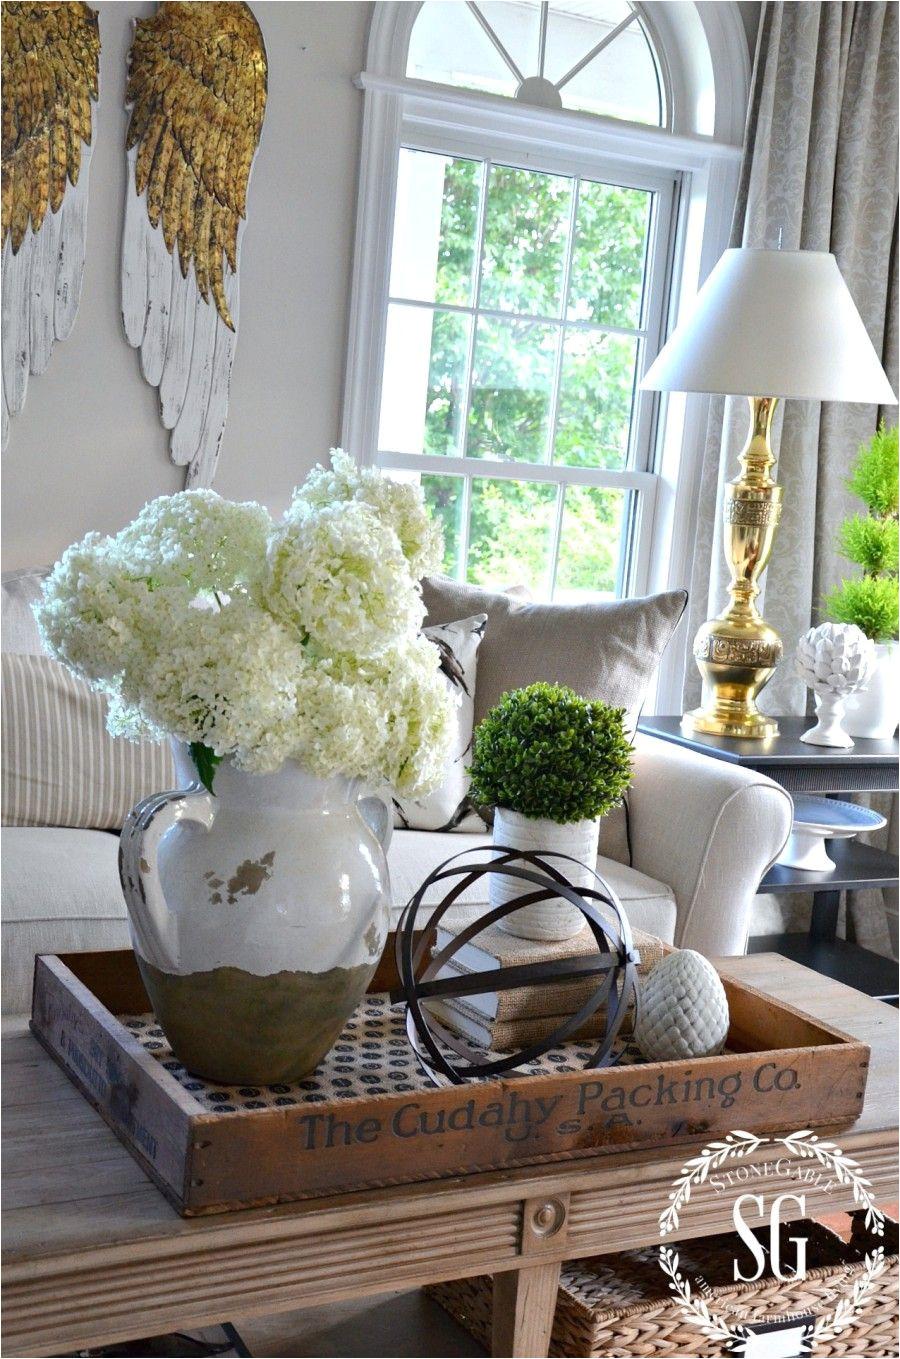 i love the idea of putting the coffee table decor on a wooden tray looks decoracia n de bandejadecoraciones rosadasdecoracion countrymesa